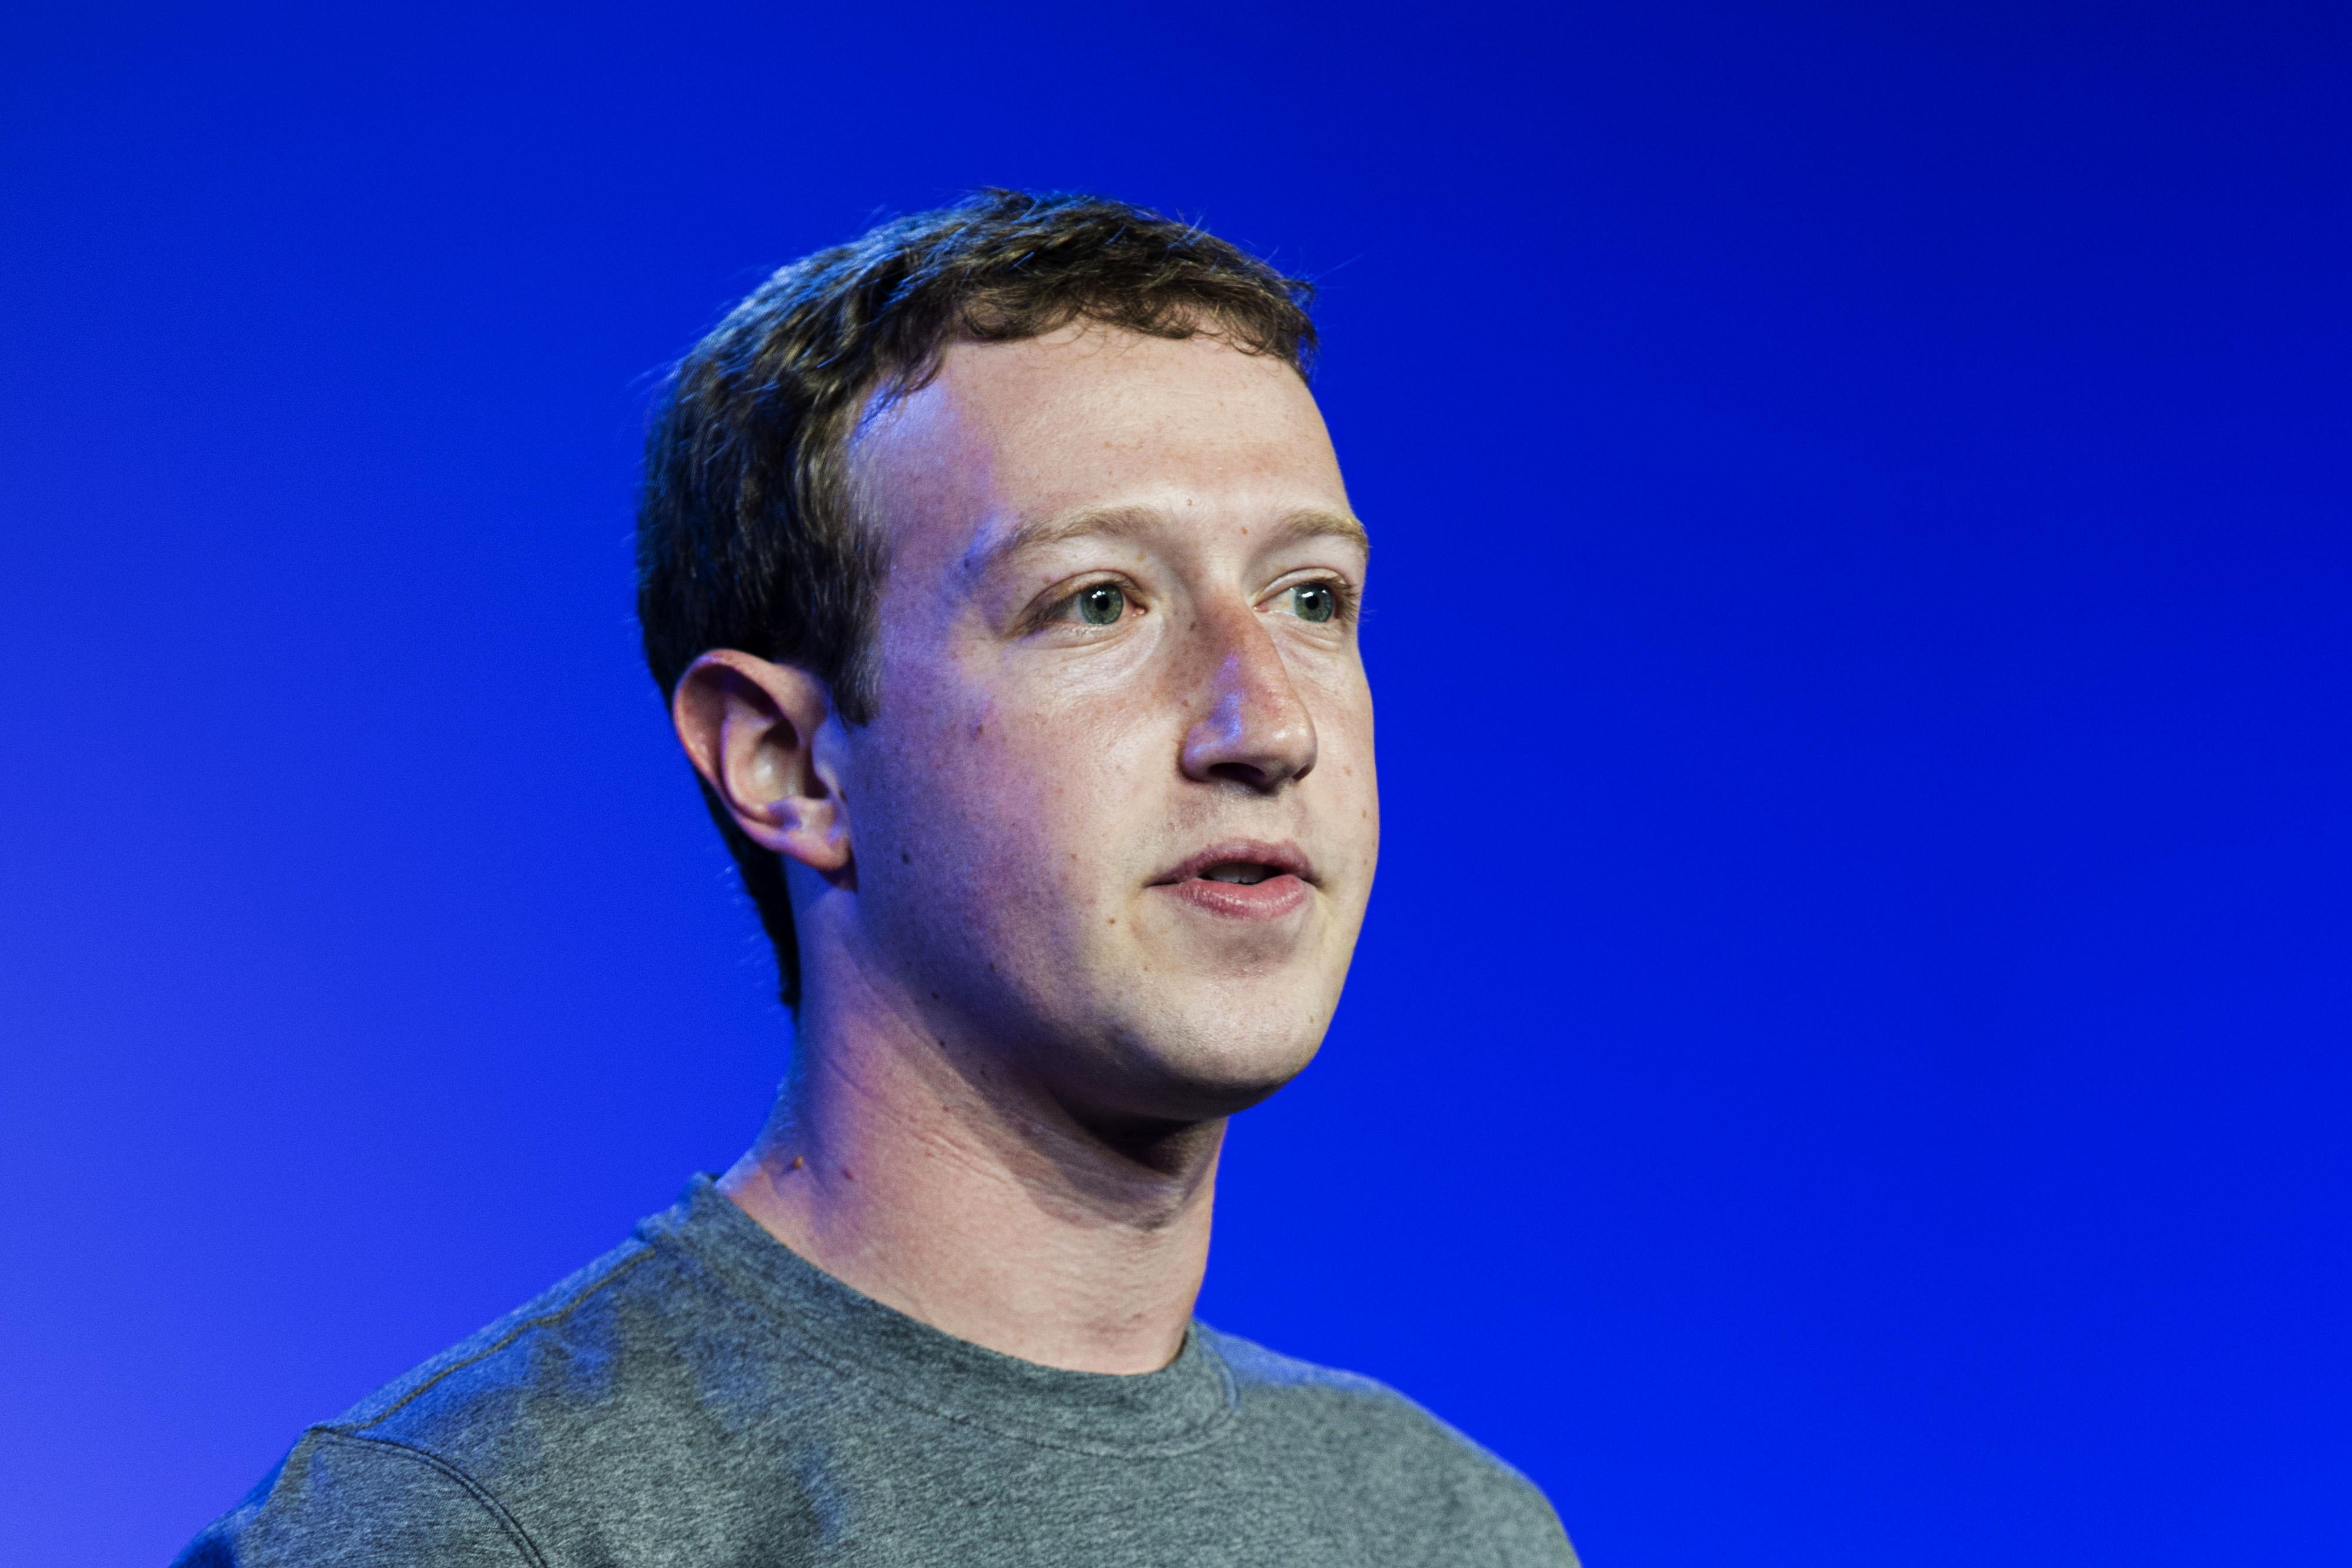 Mark Zuckerberg CEO of Facebook speaks during the Internet.org summit in New Delhi on Oct. 9, 2014.